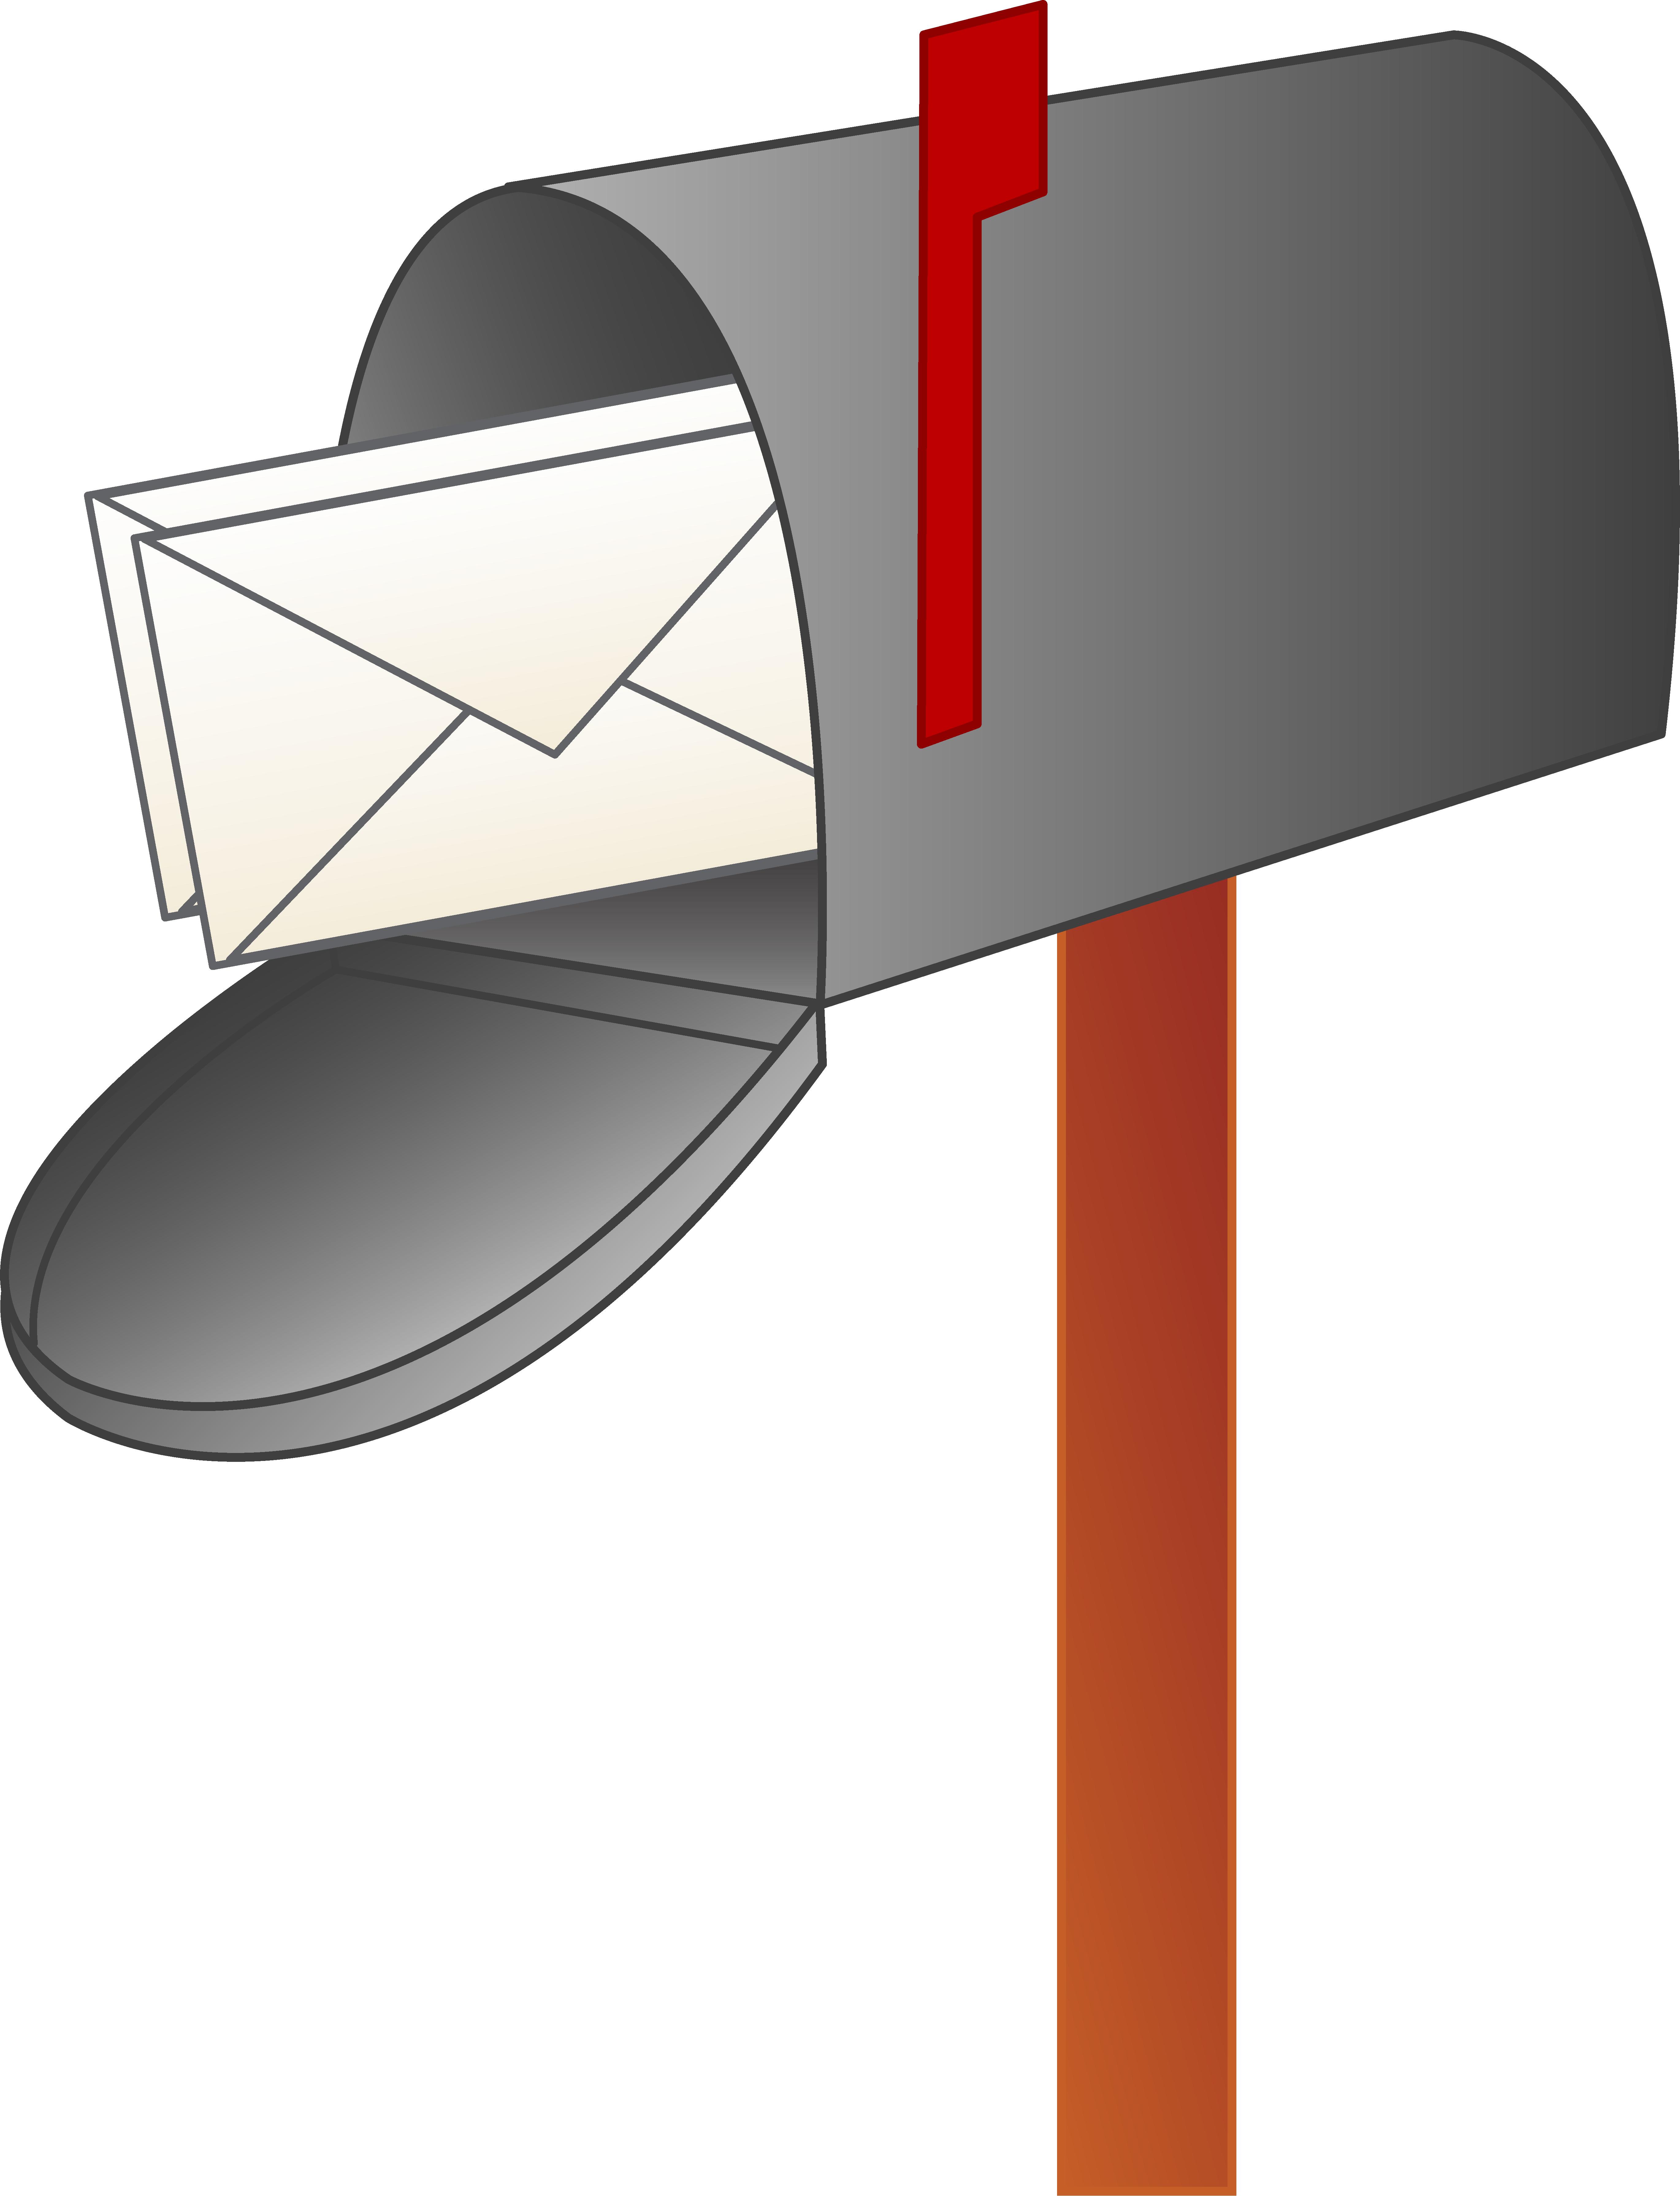 Cartoon Mailbox Clipart-Cartoon Mailbox Clipart-5